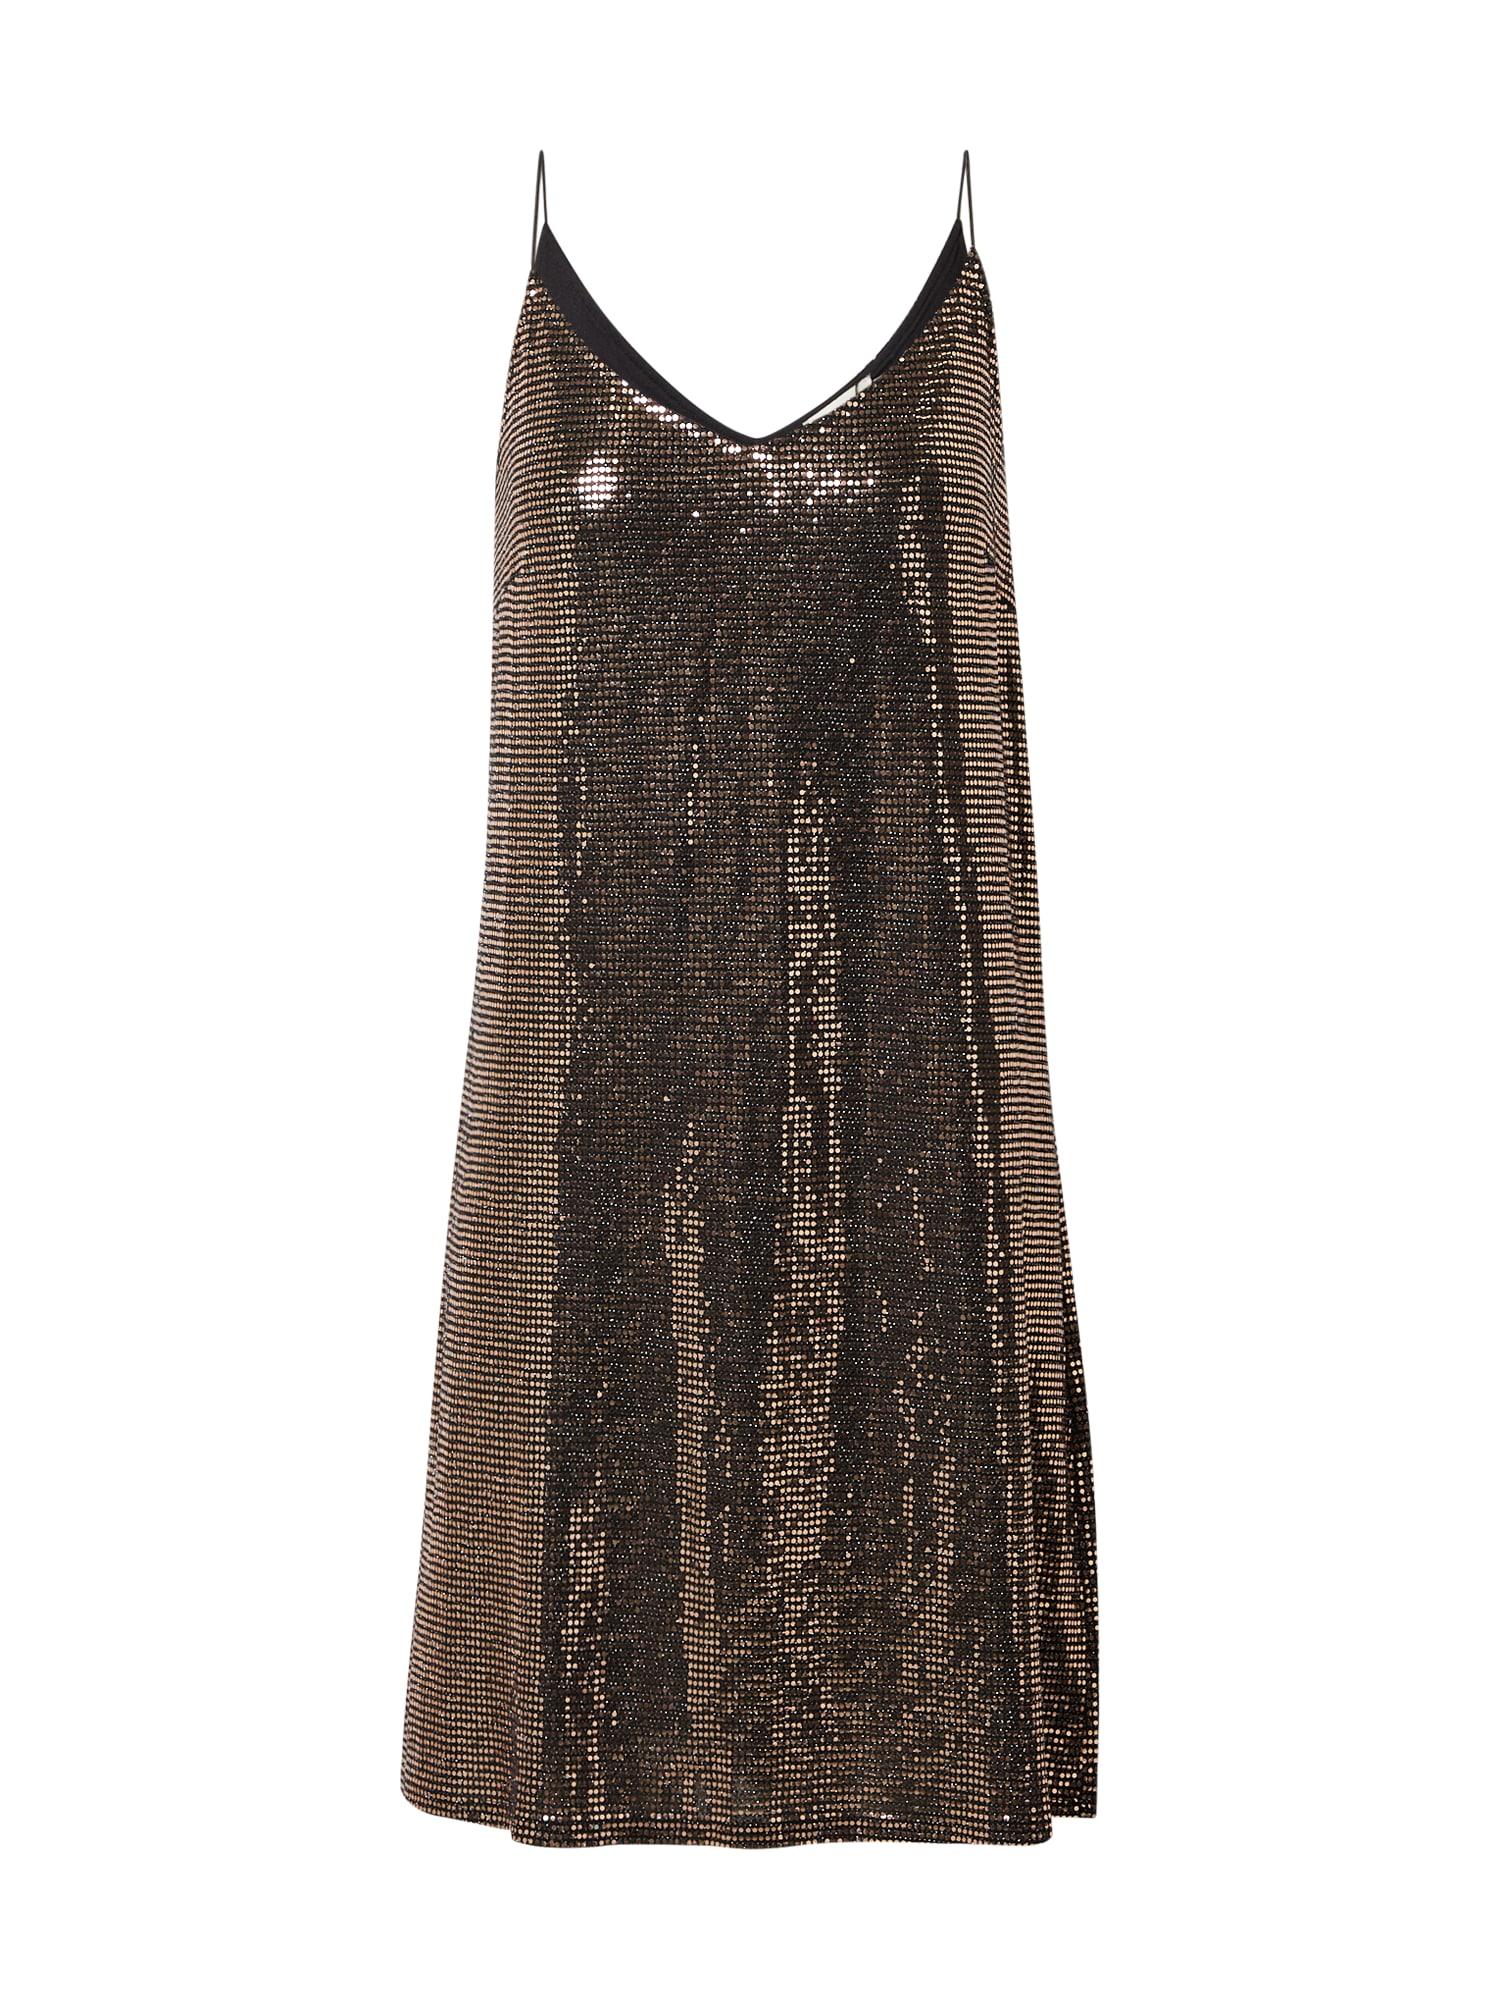 Molly BRACKEN Suknelė